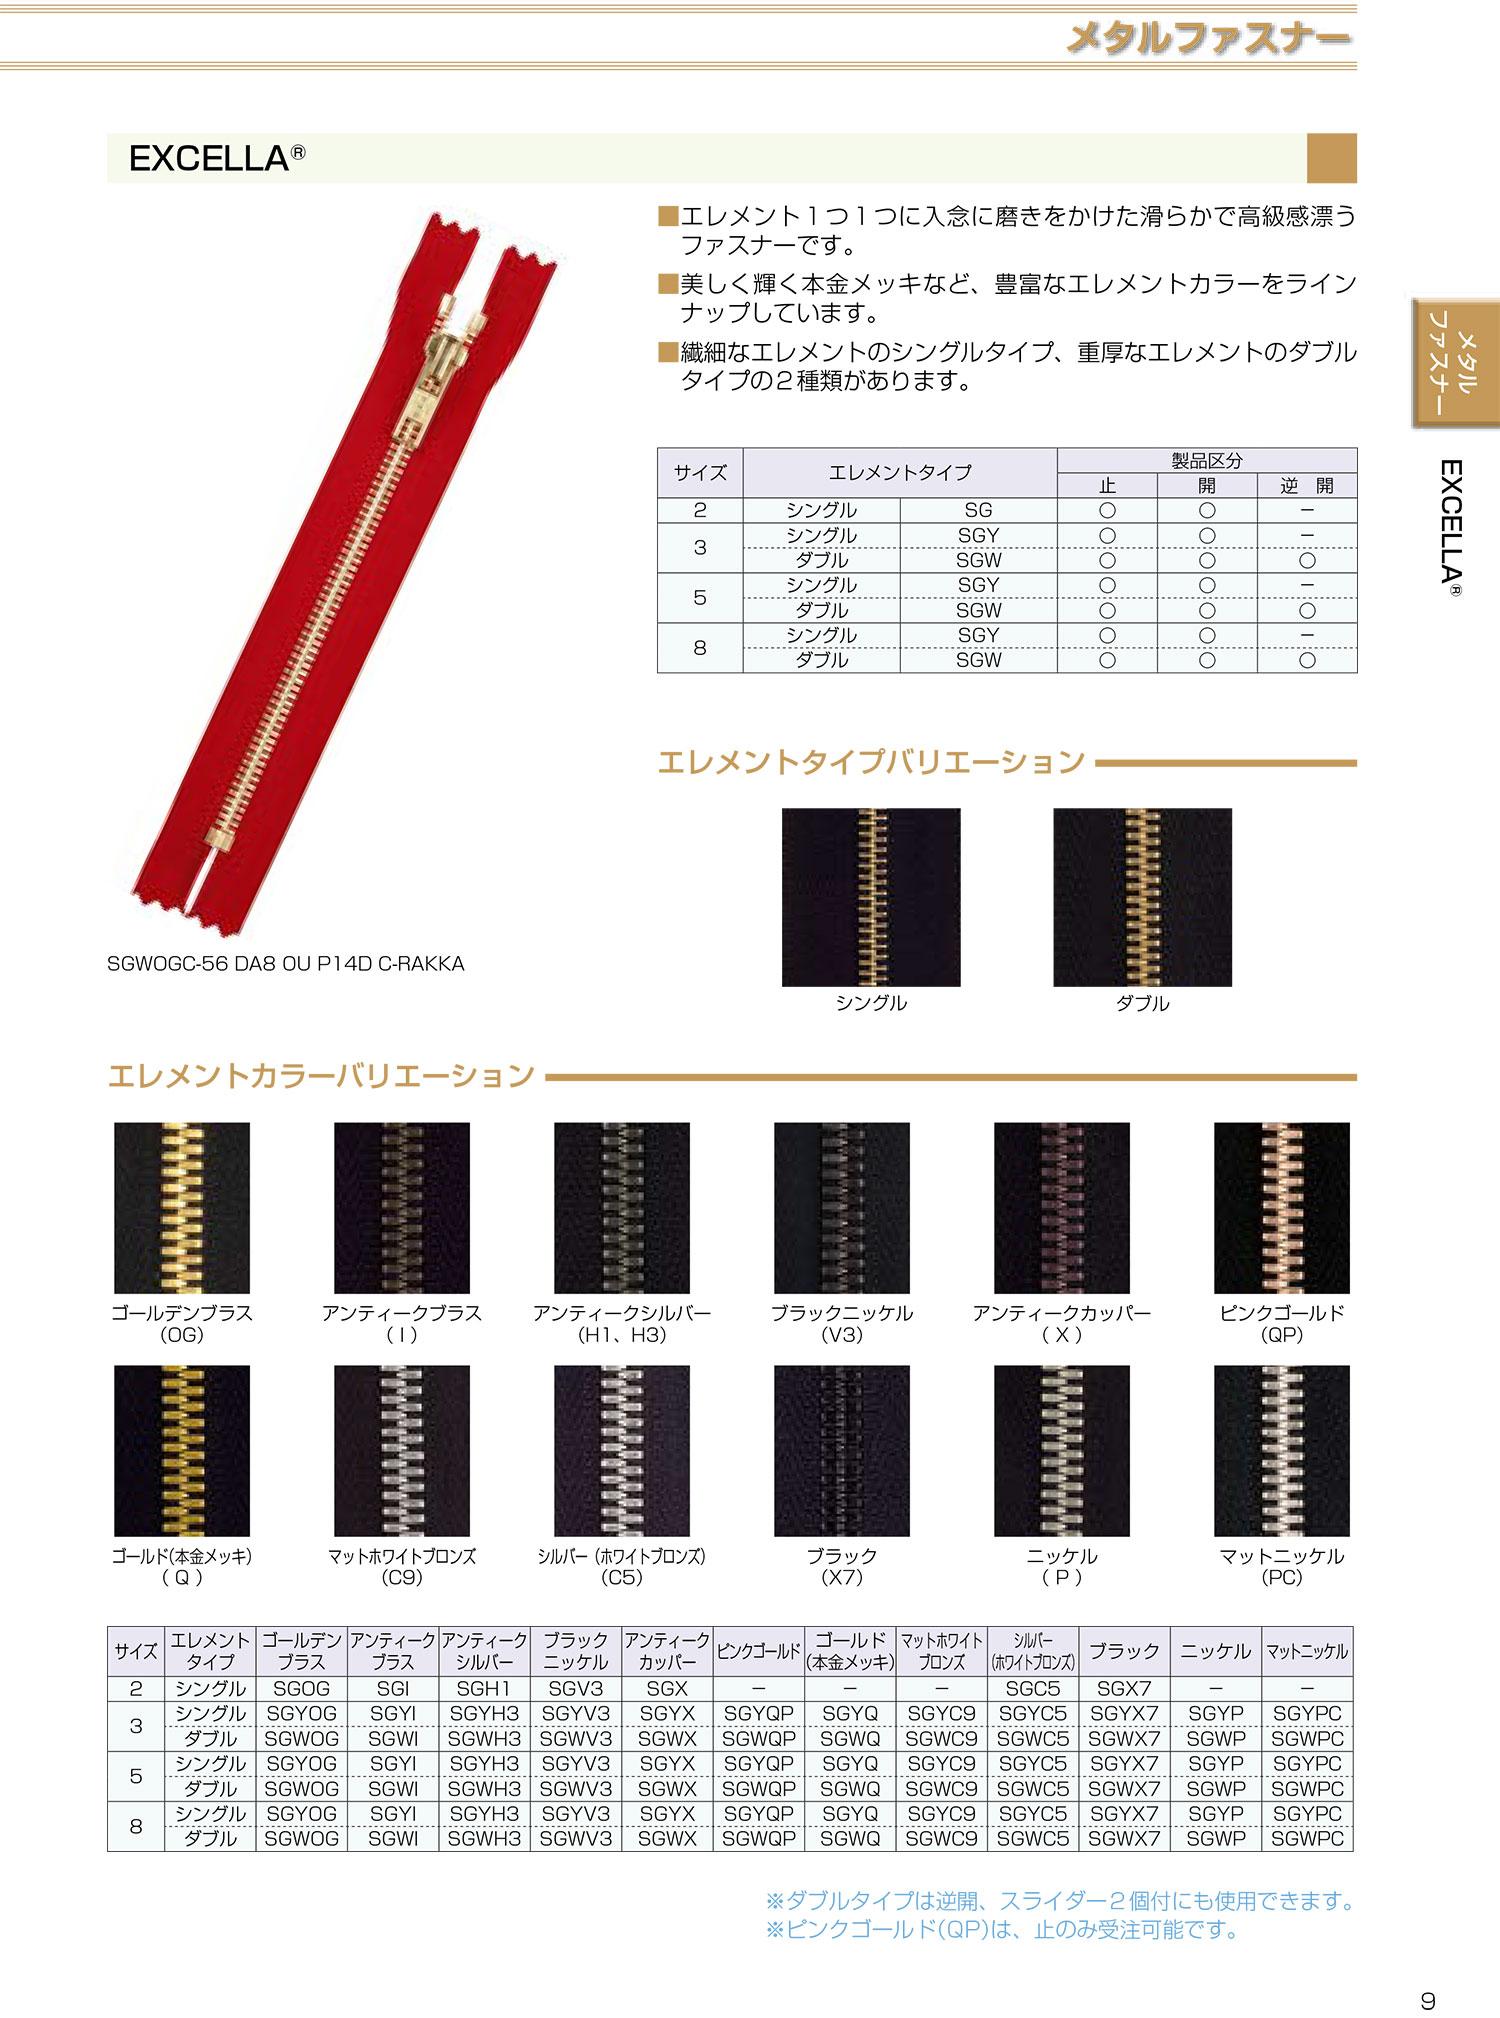 8SGWV3MR エクセラ 8サイズ ブラックニッケル 逆開 ダブル[ファスナー] YKK/オークラ商事 - ApparelX アパレル資材卸通販